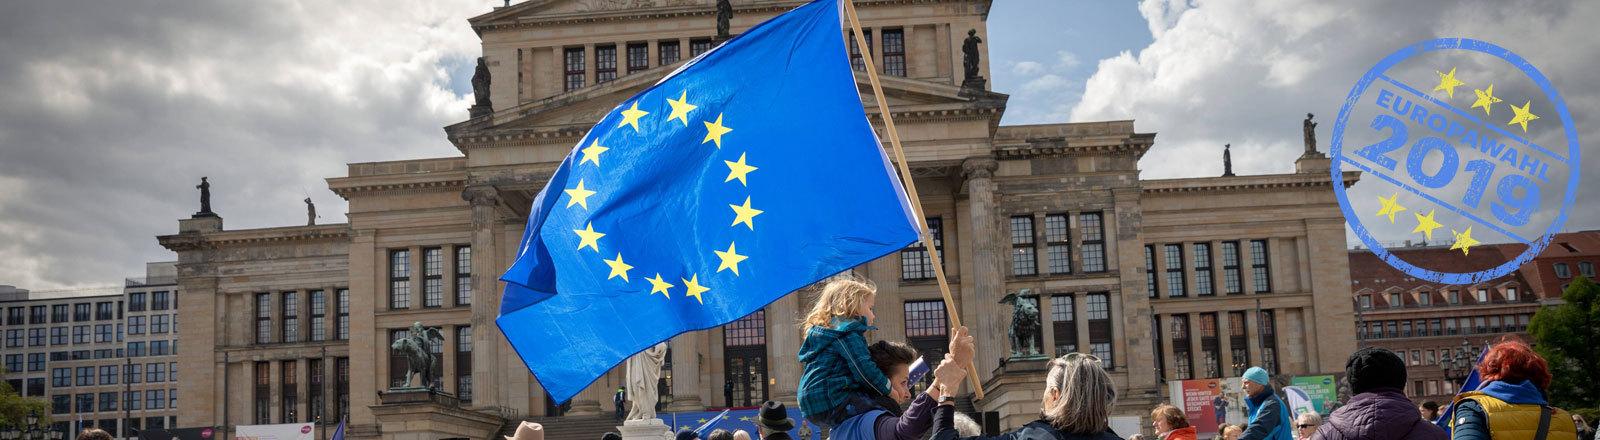 Demo von Pulse for Europe in Berlin 5.5.19